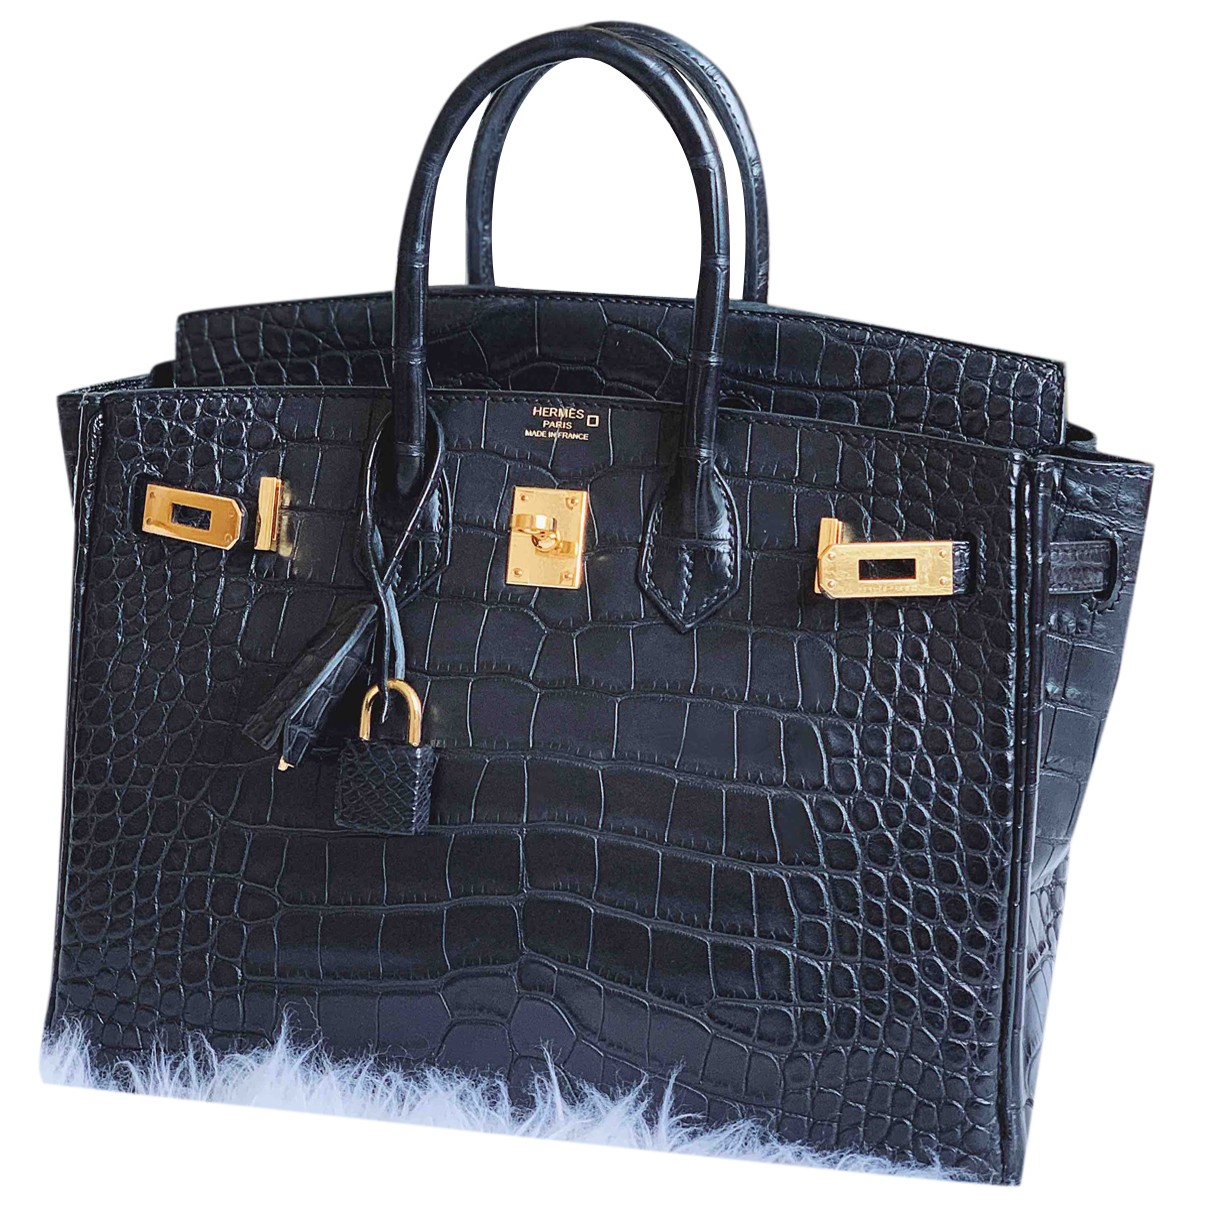 Hermes Birkin 25 Handtasche in  Schwarz Leder